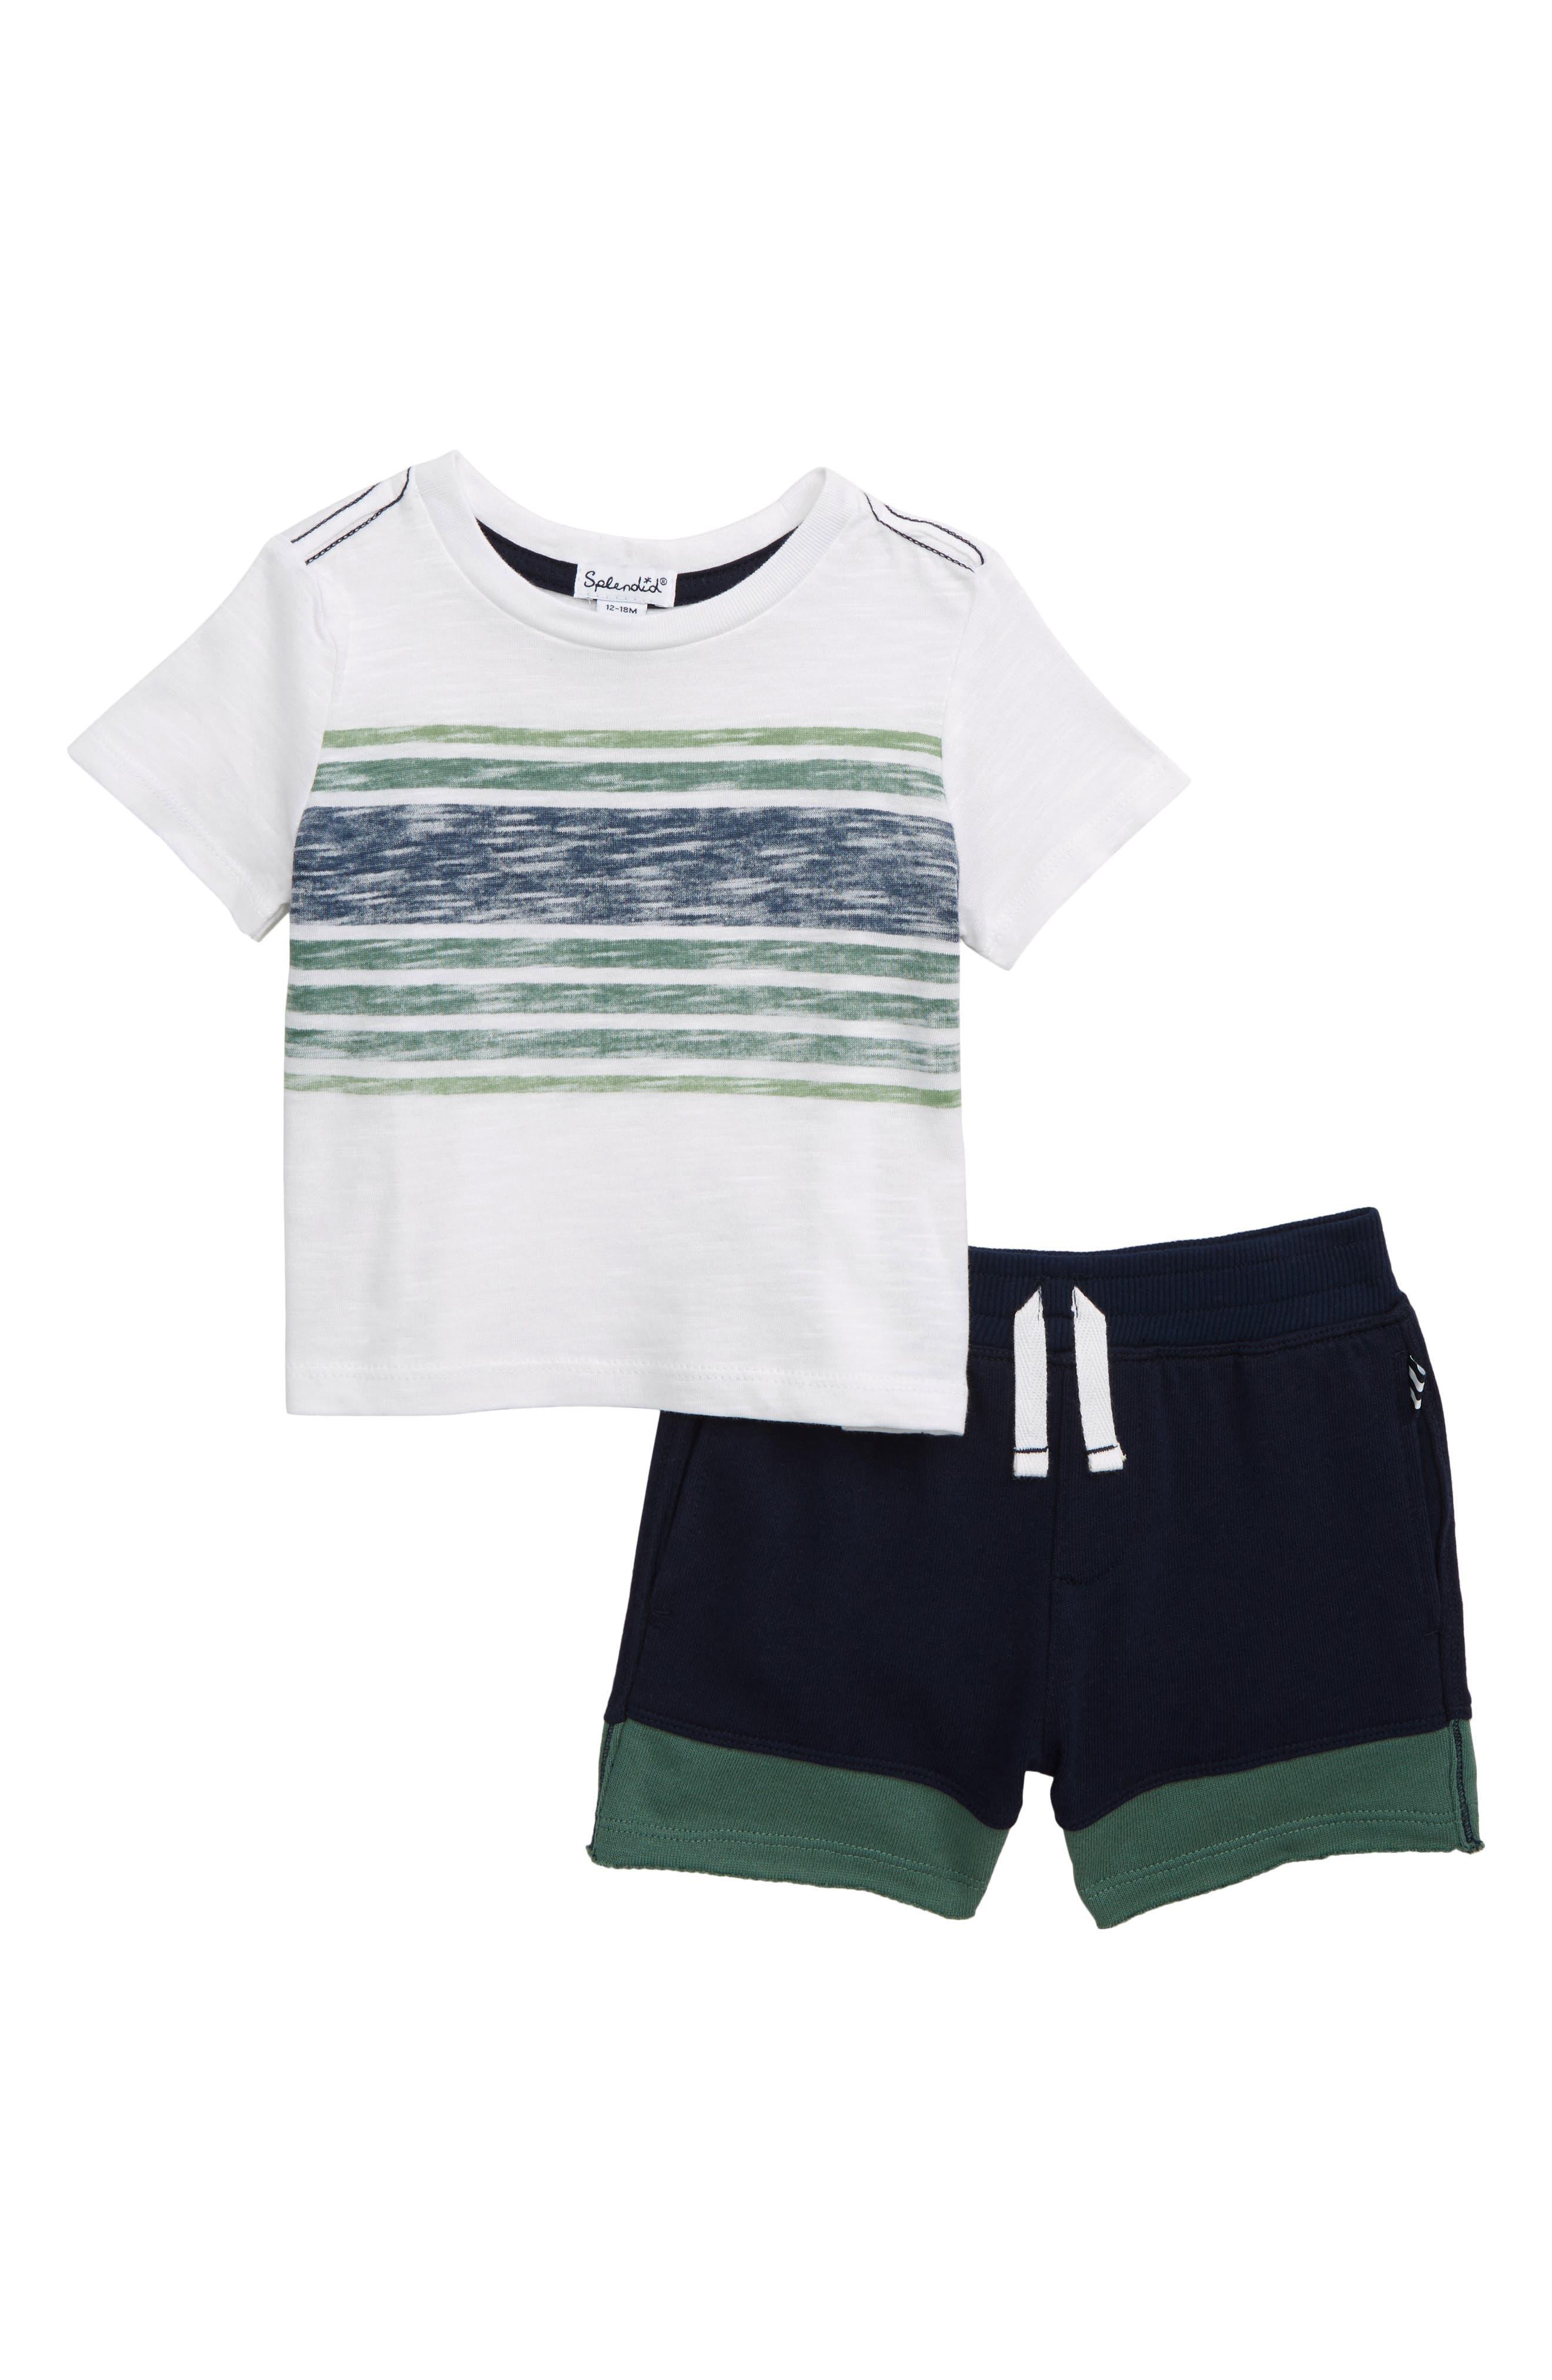 SPLENDID Reverse Stripe T-Shirt & Shorts Set, Main, color, WHITE VERANDA